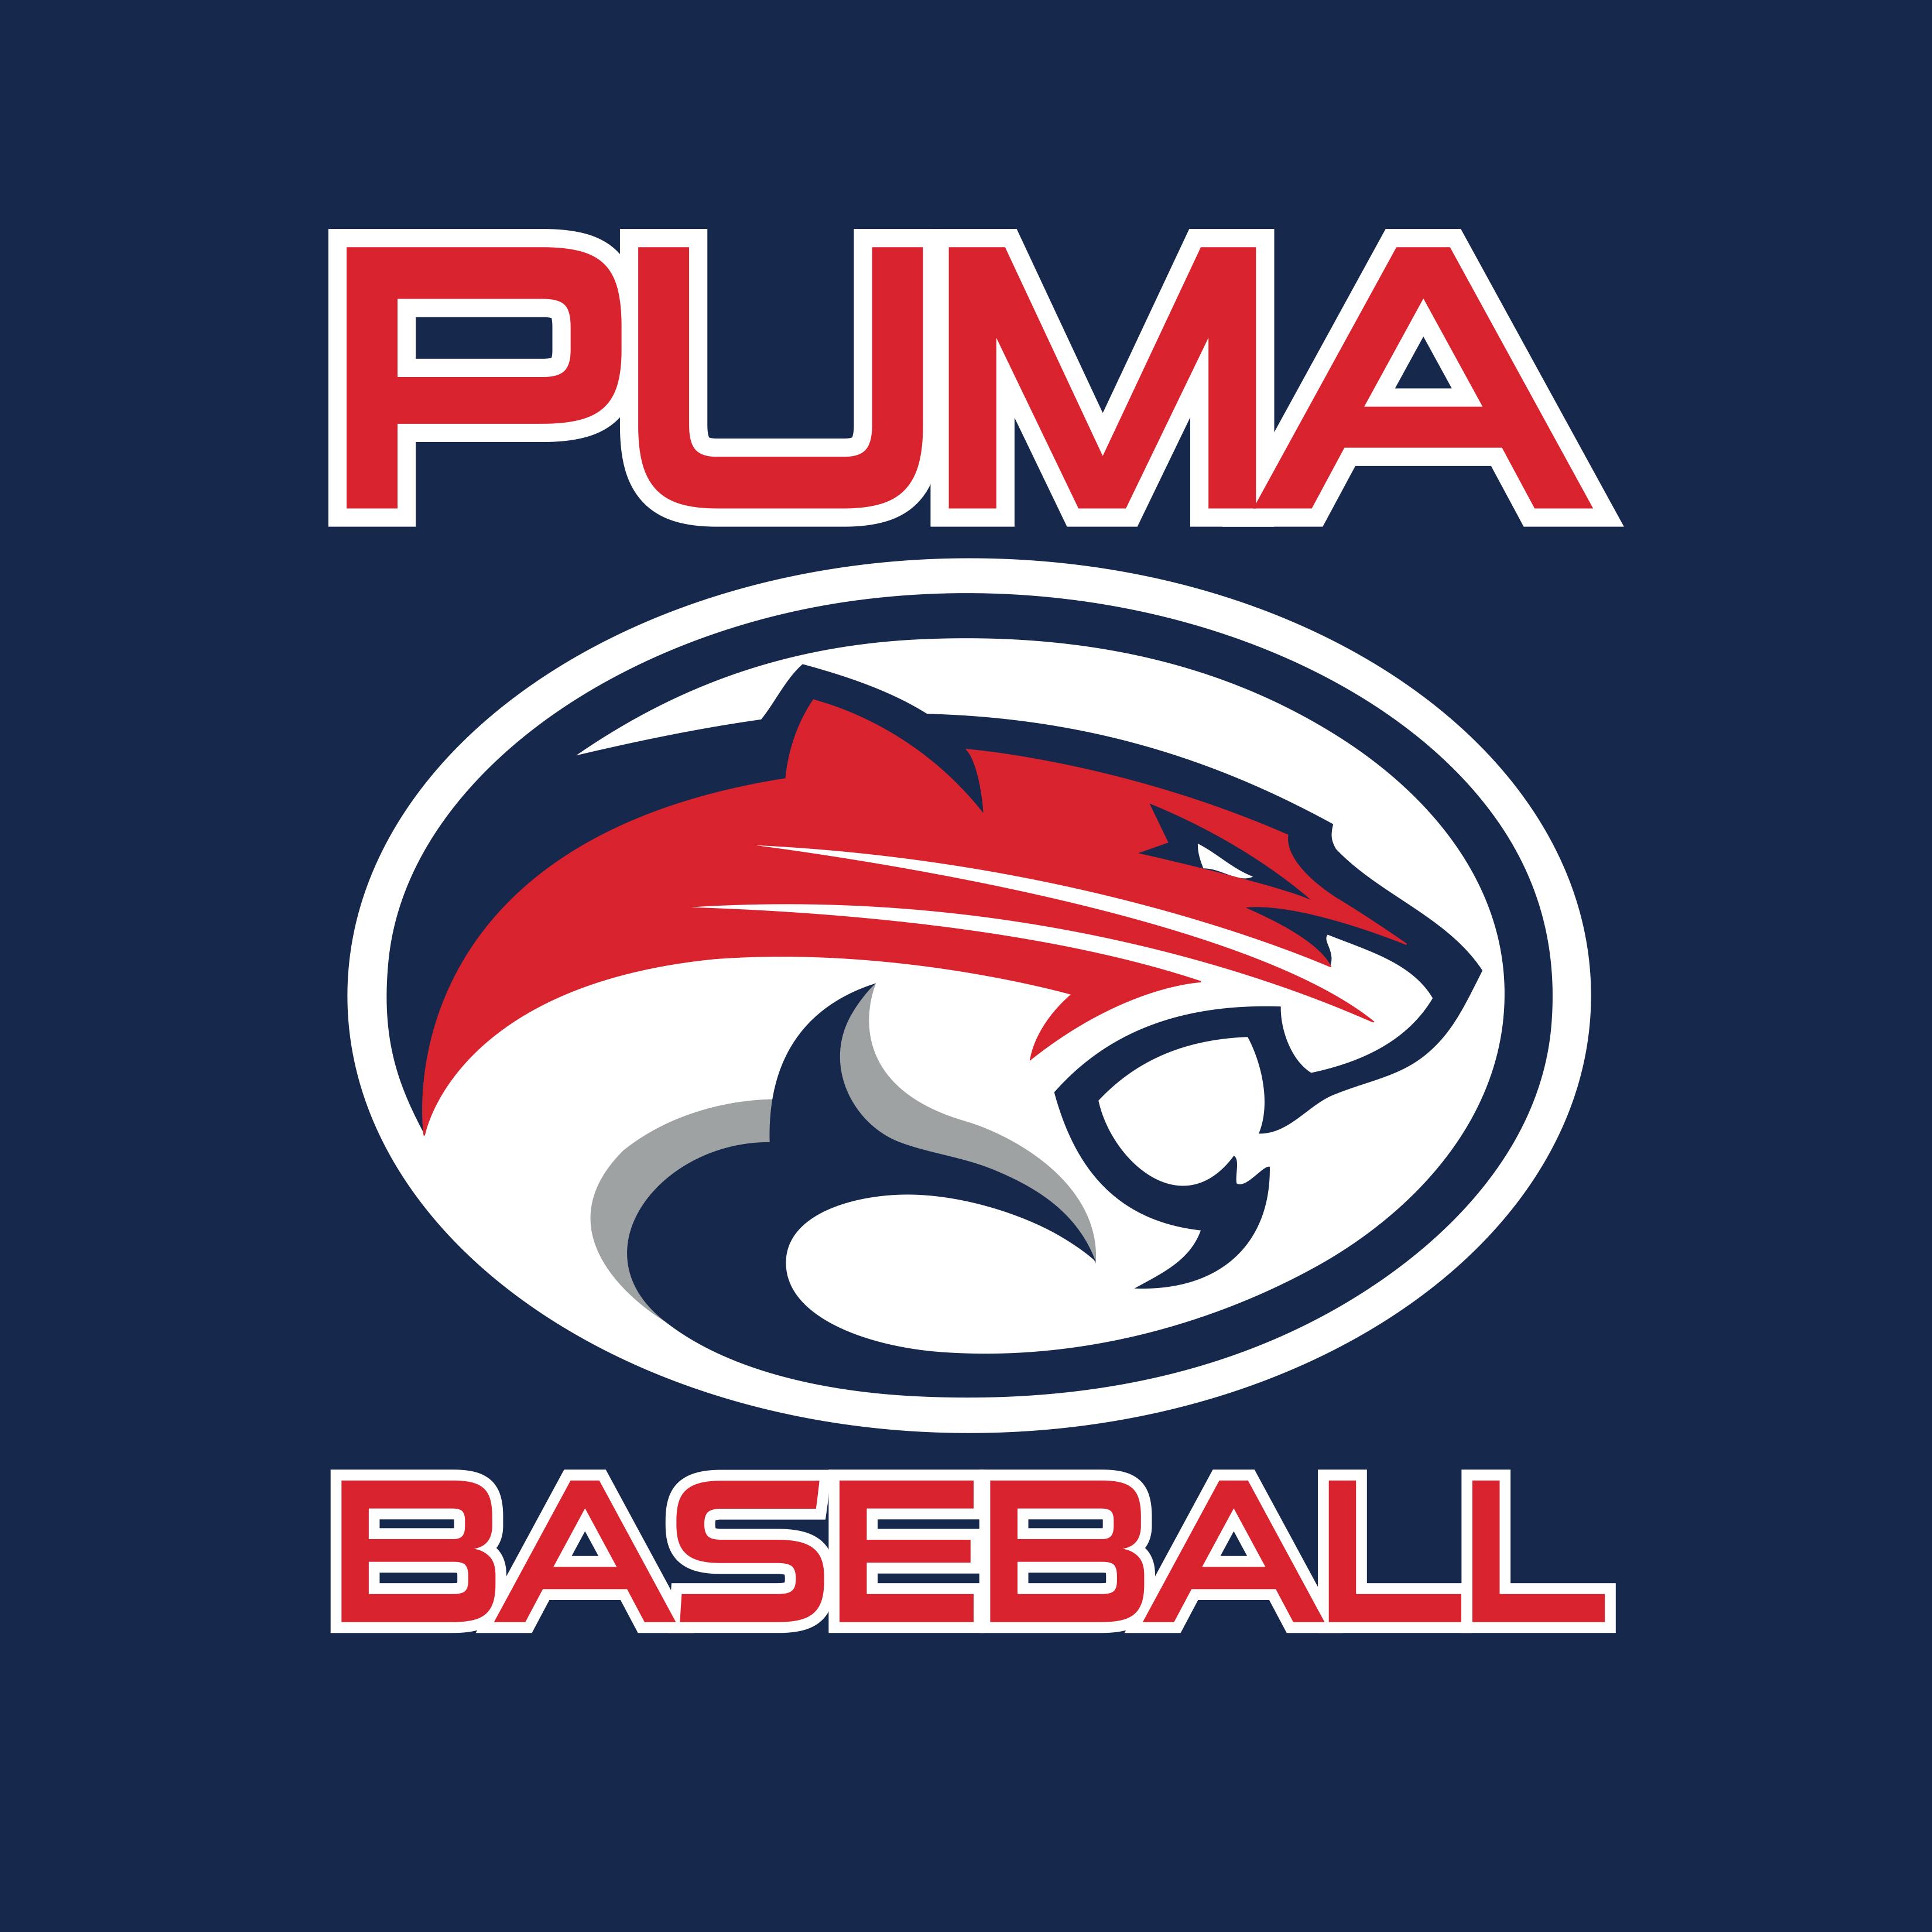 puma club team